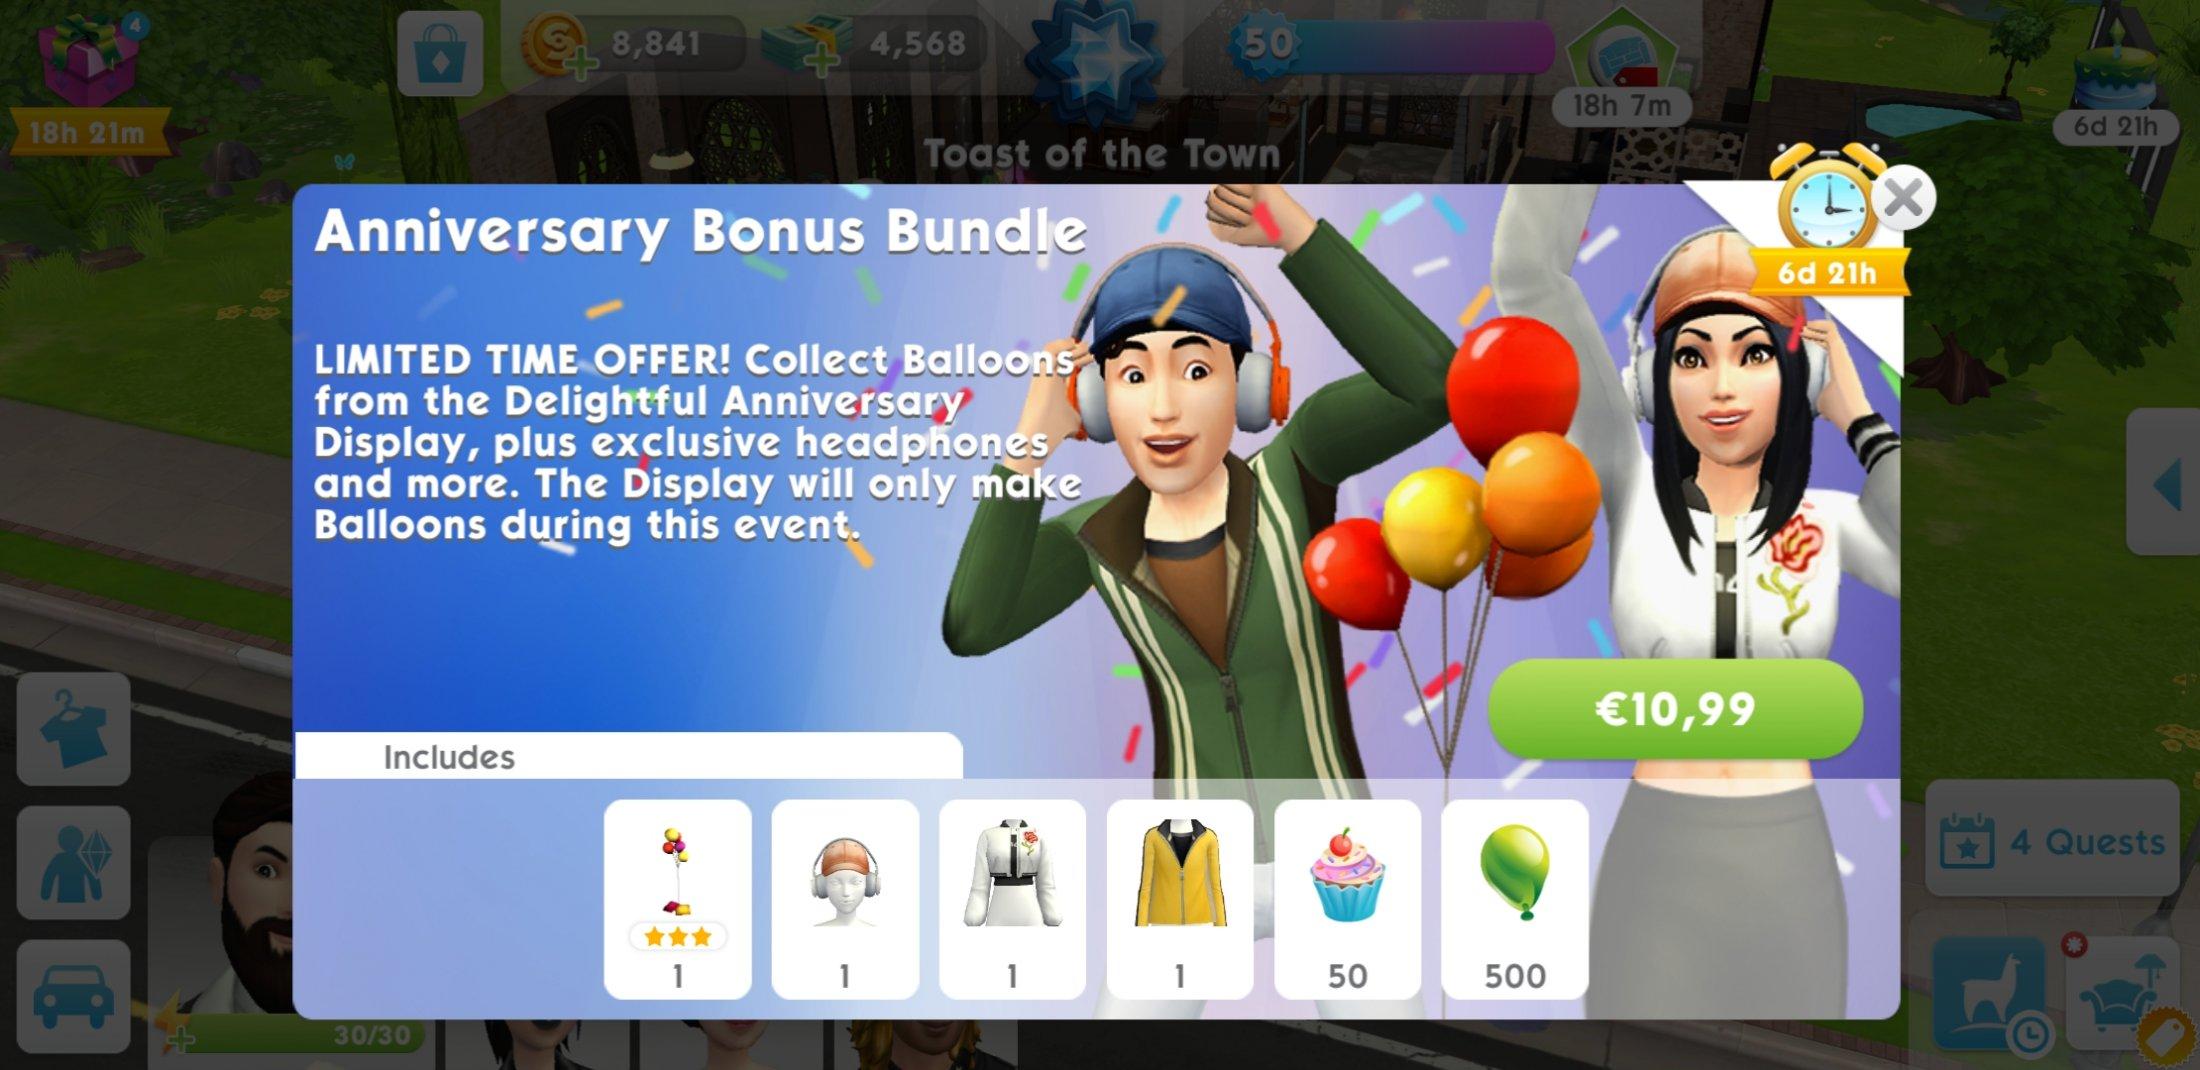 Anniversary Bonus Bundle